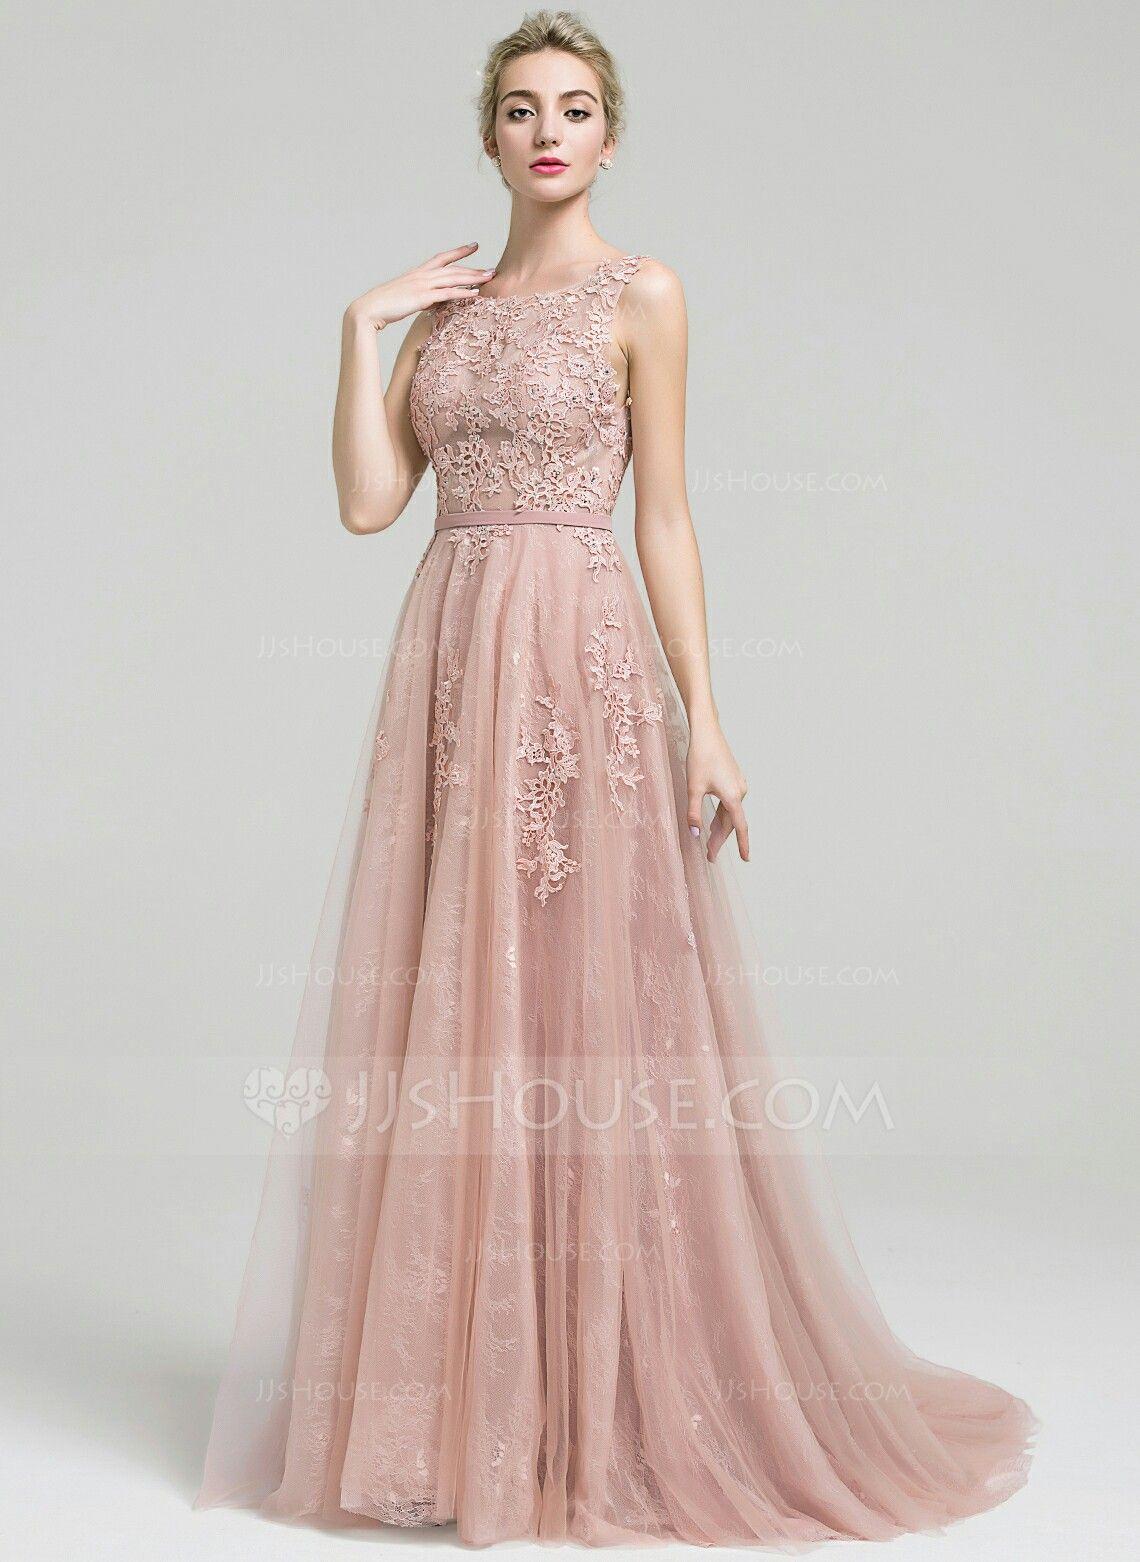 prom dress | Dresses | Pinterest | Vestidos de dama, Vestiditos y Madres